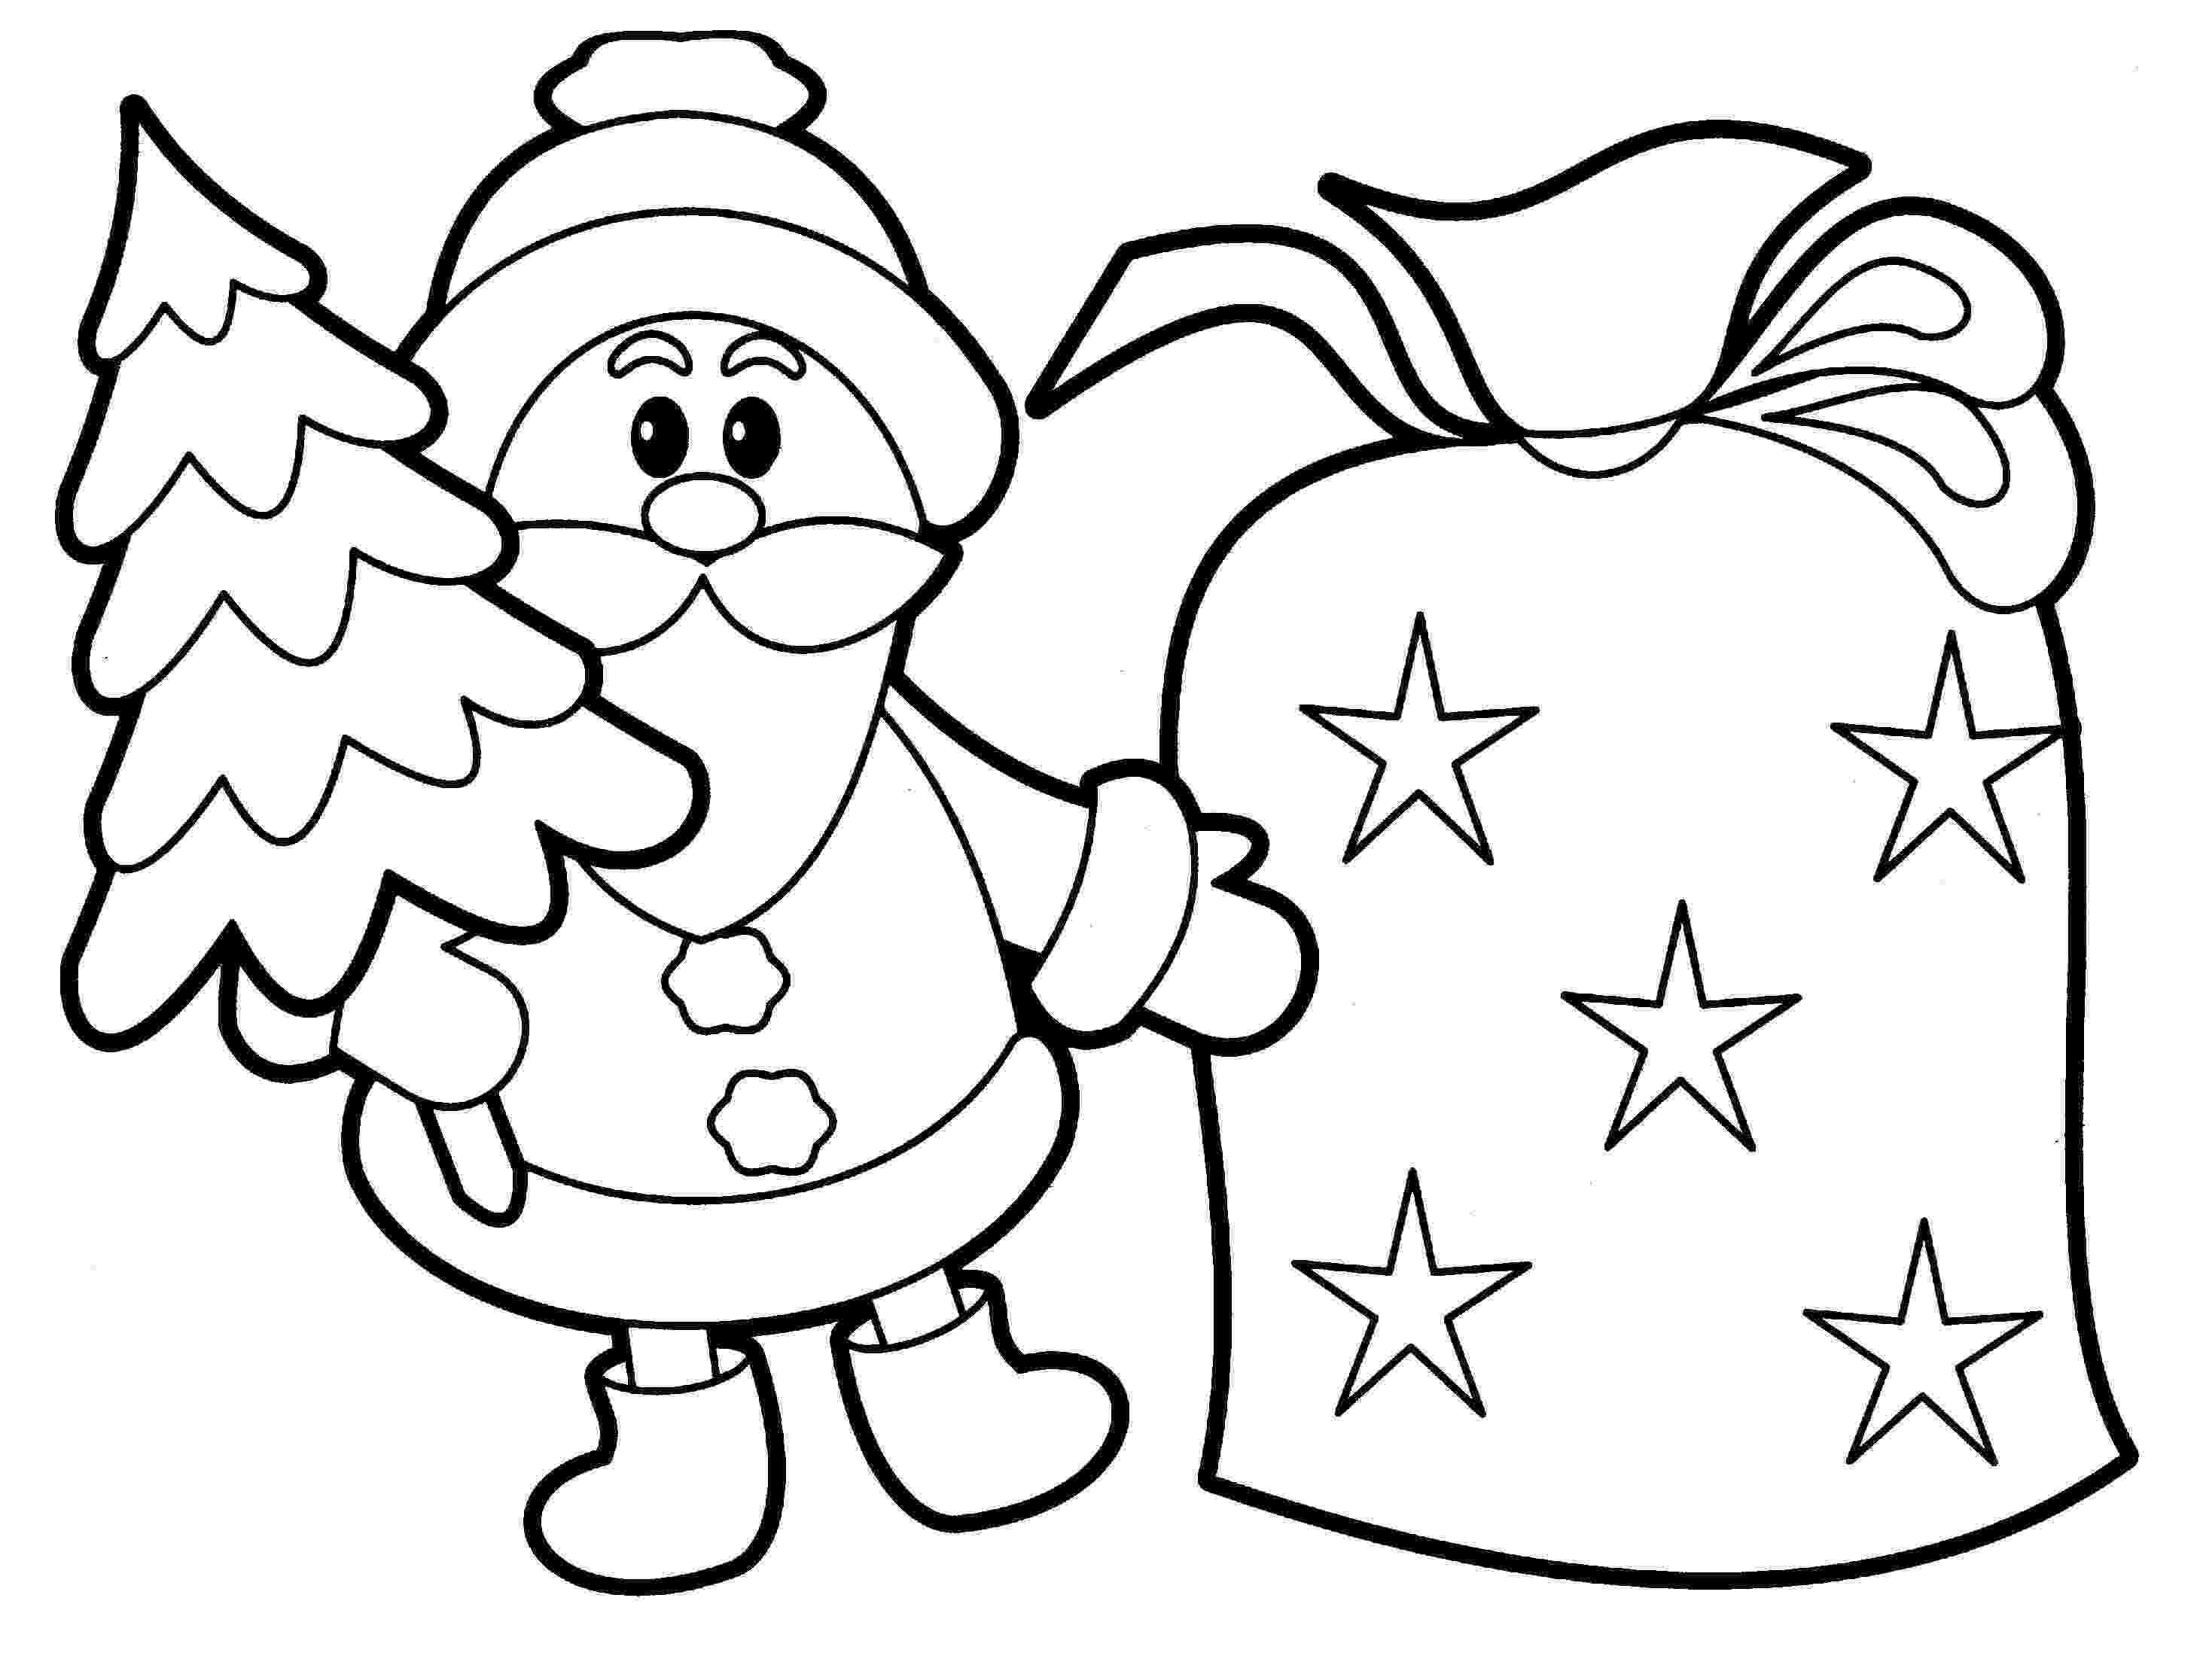 christmas coloring sheets free hello kitty christmas coloring page free printable sheets coloring christmas free